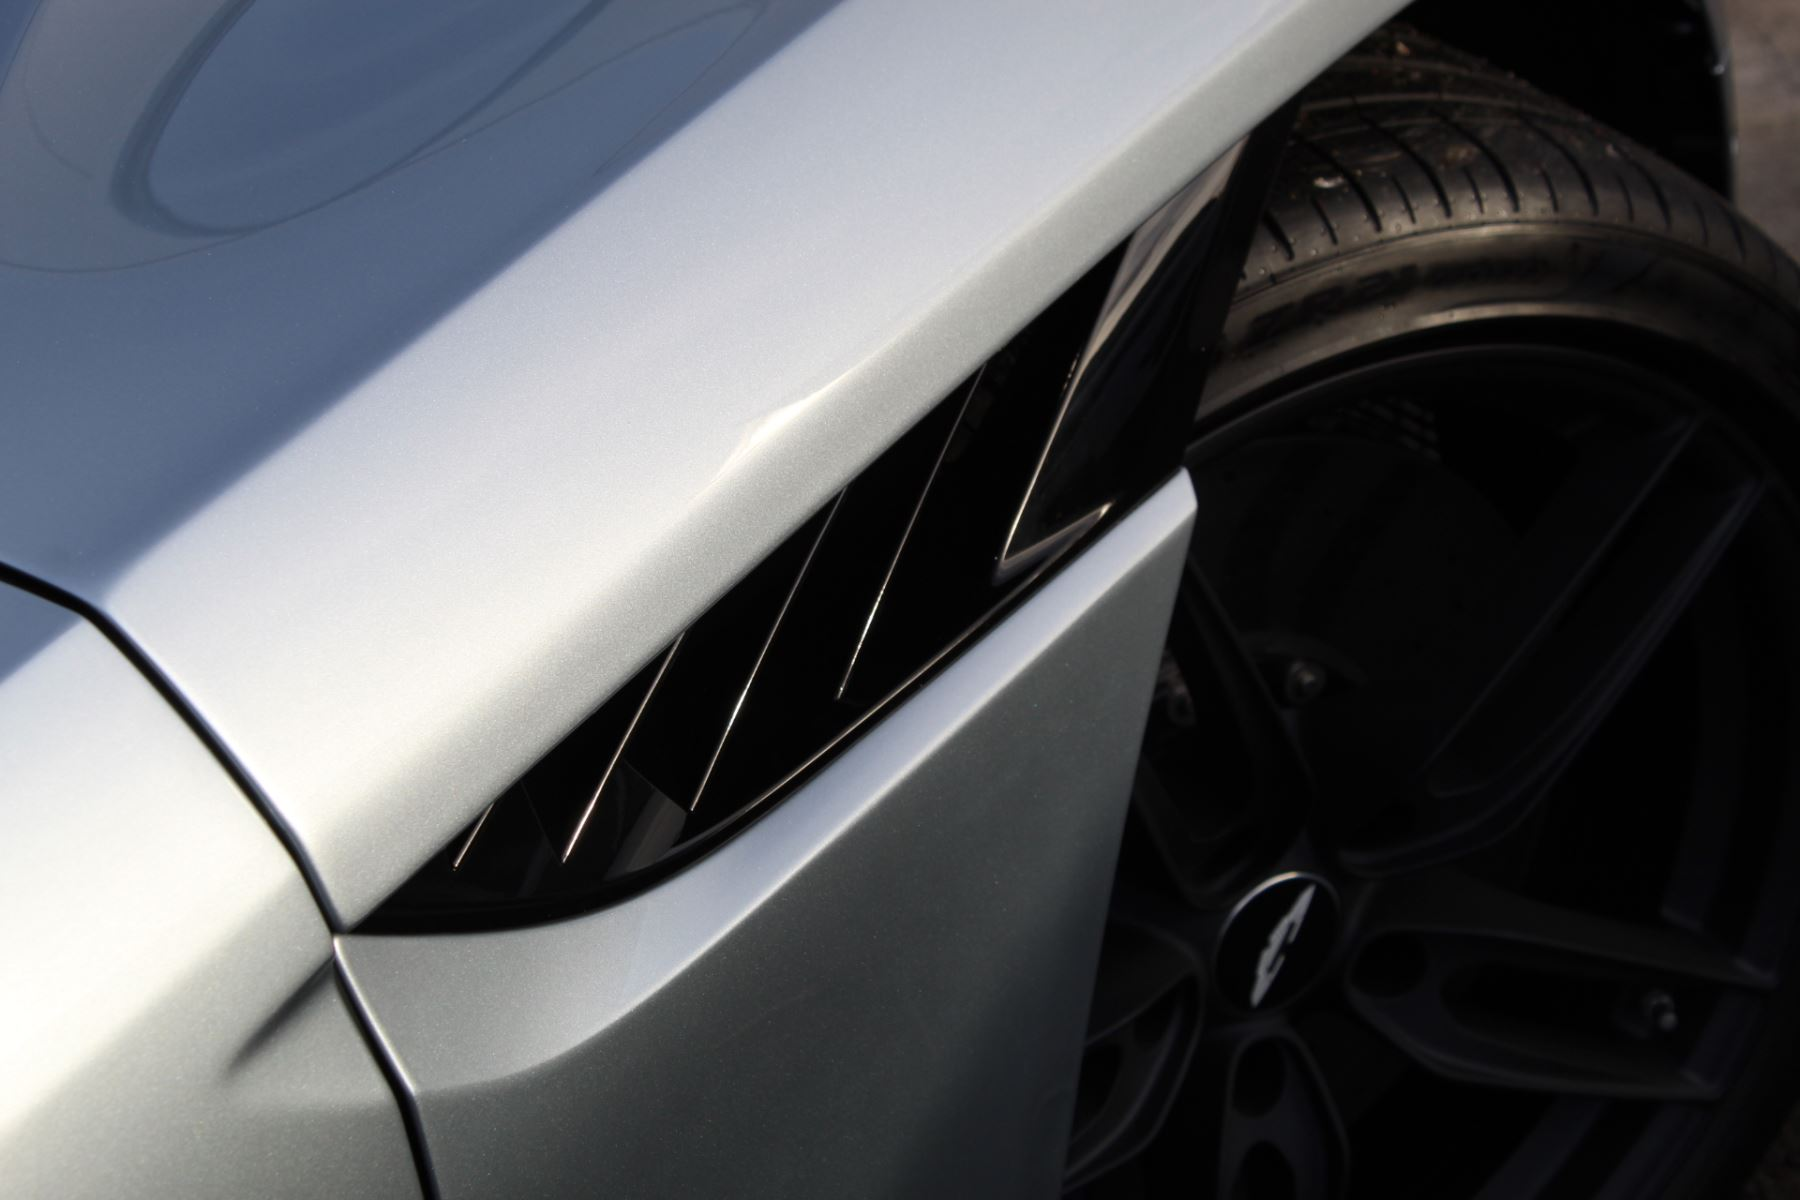 Aston Martin DBS Superleggera V12 2dr Touchtronic image 31